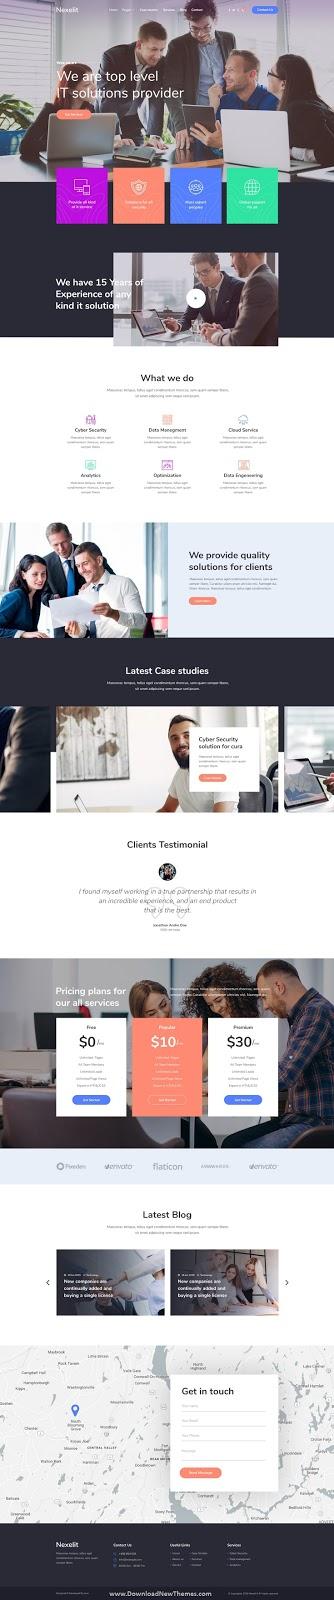 Startup Business PSD Template